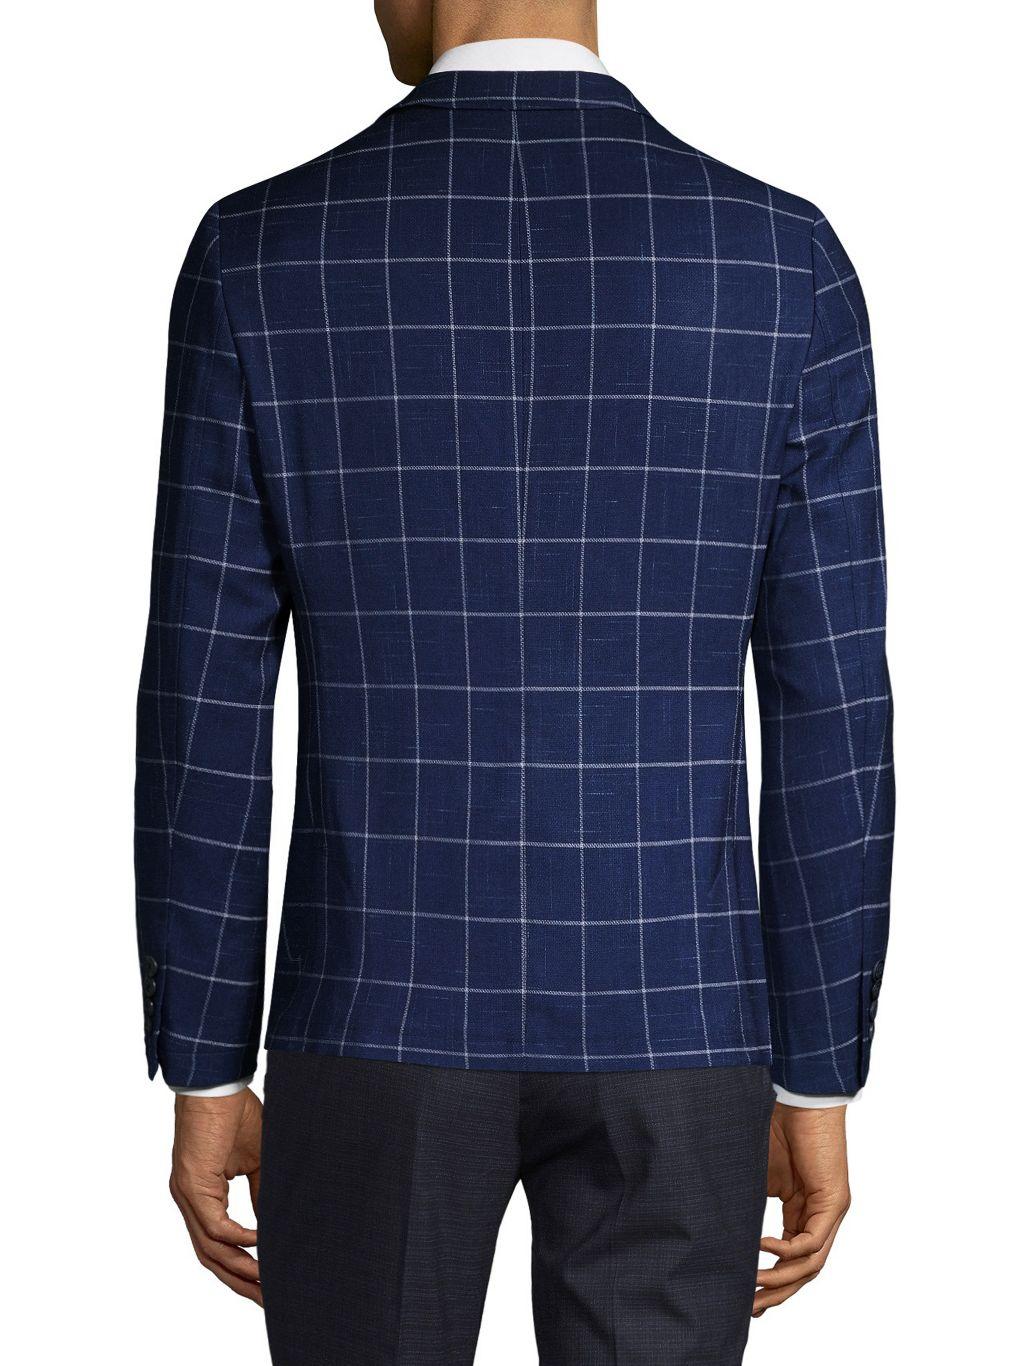 NHP Extra Slim-Fit Windowpane-Print Jacket